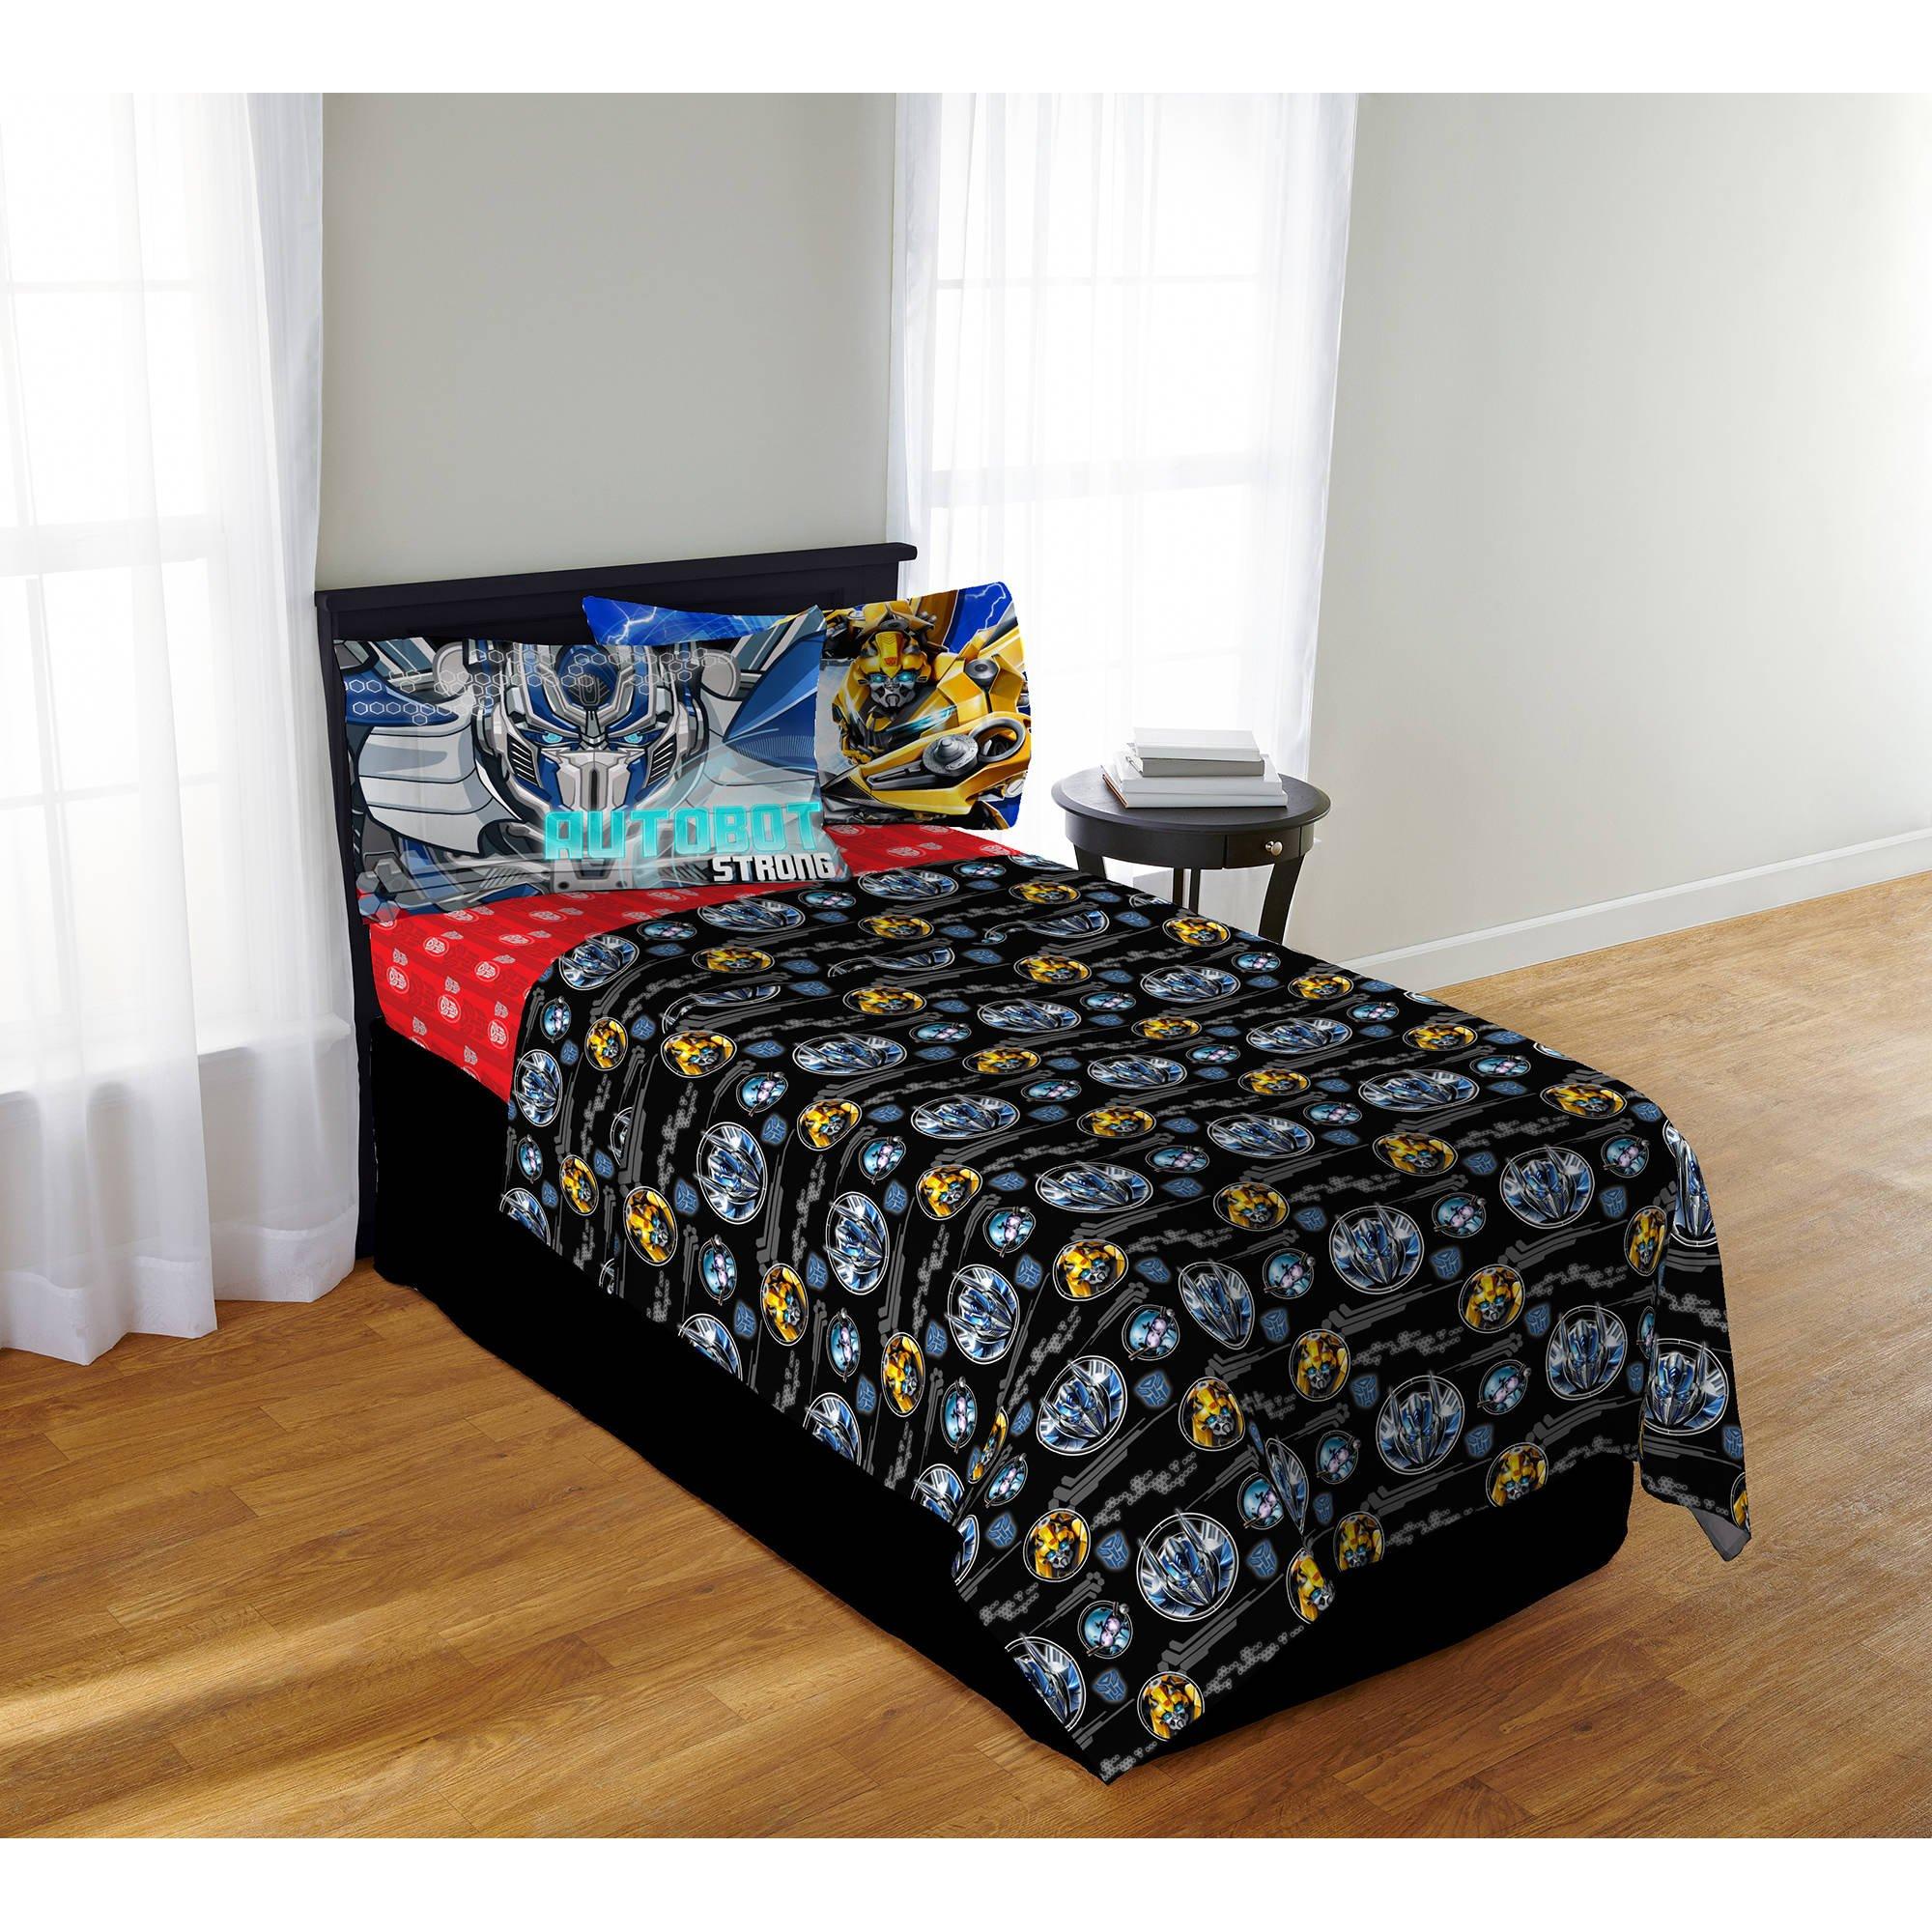 Transformers 5 Autobot Boys Twin Comforter, Sheets & BONUS SHAM (5 Piece Bed In A Bag) + HOMEMADE WAX MELTS